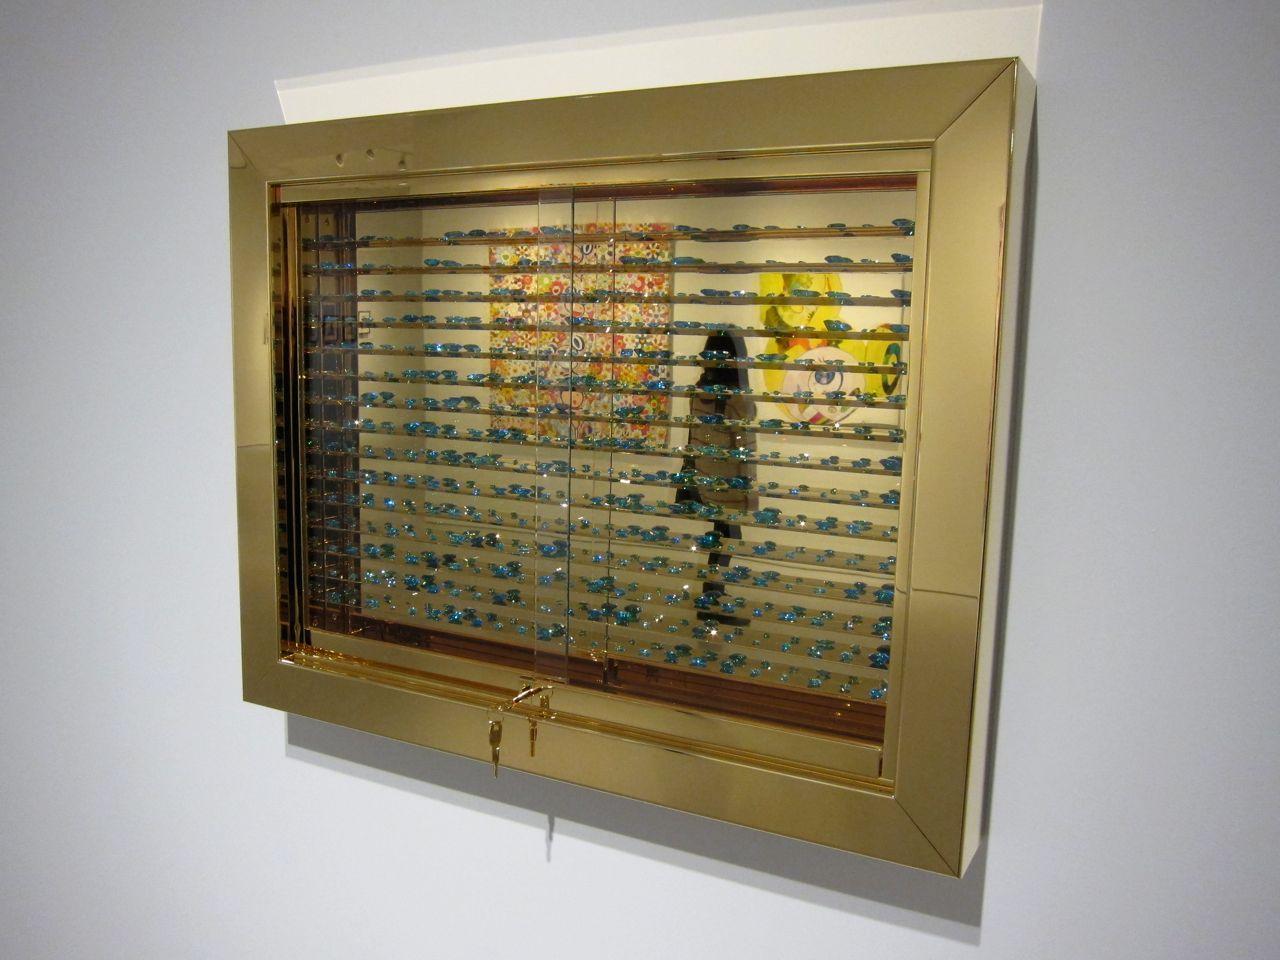 Murkami New Day Christies japan auction AM 10